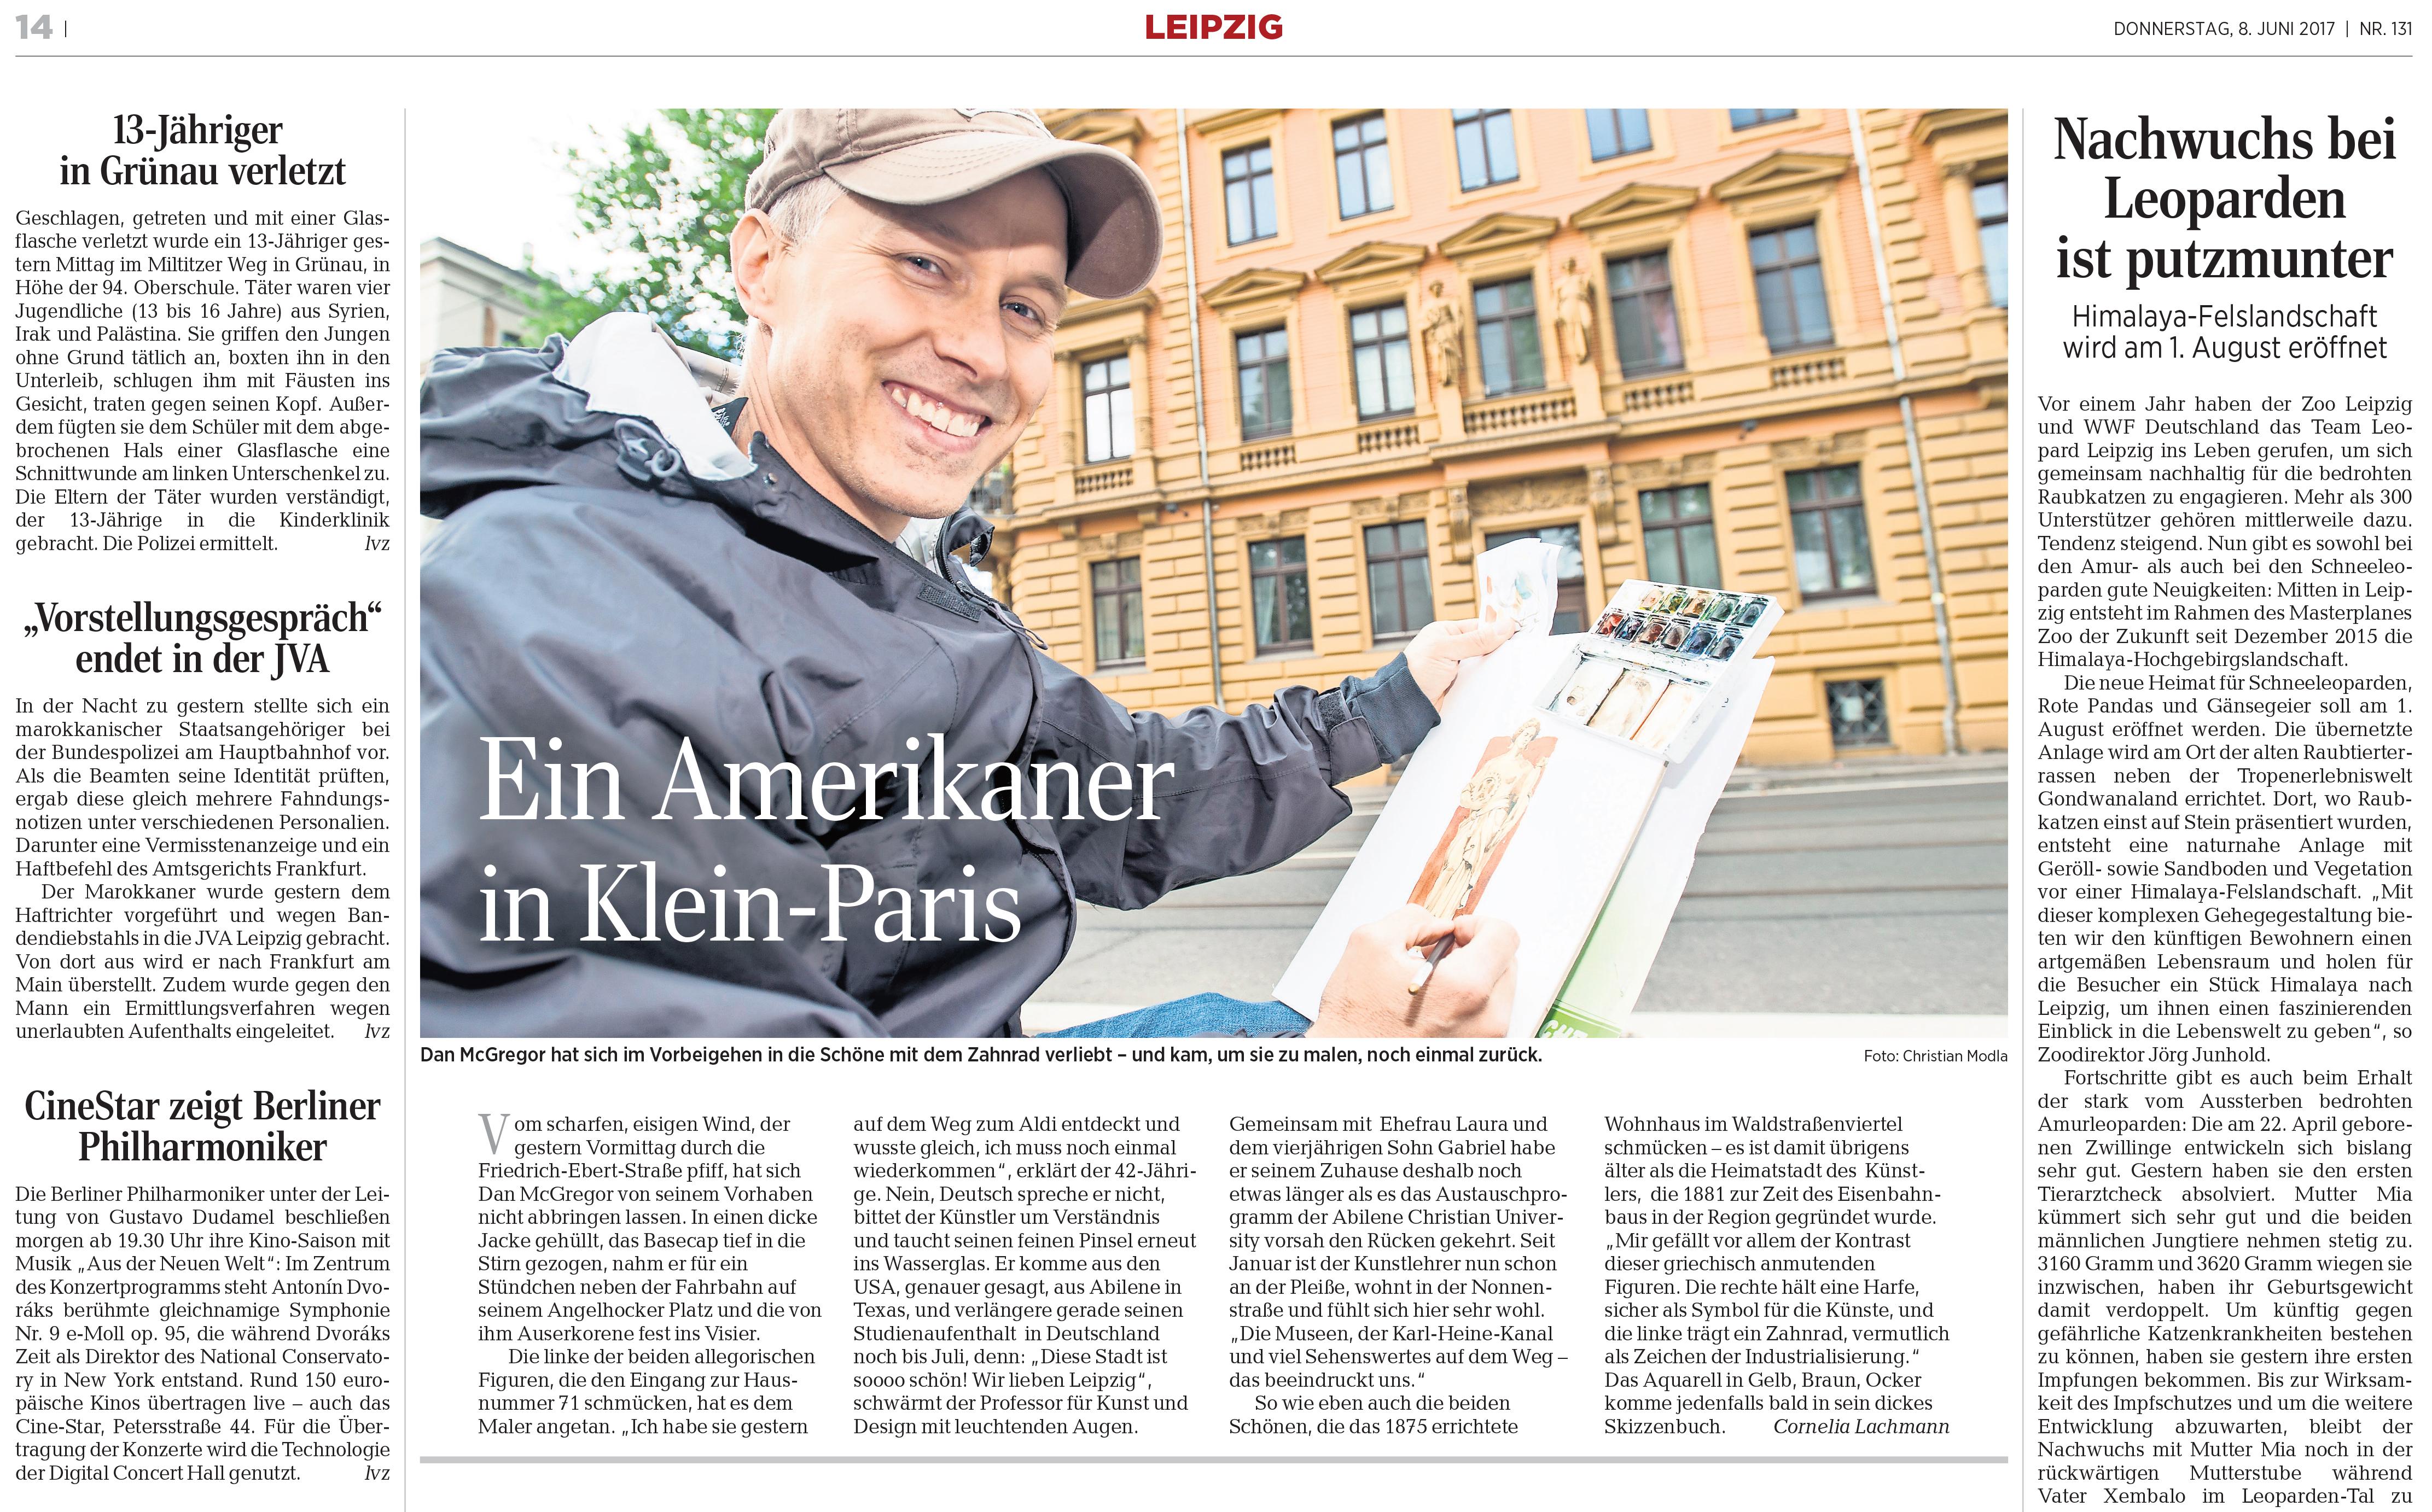 Leipzig-newspaper-story